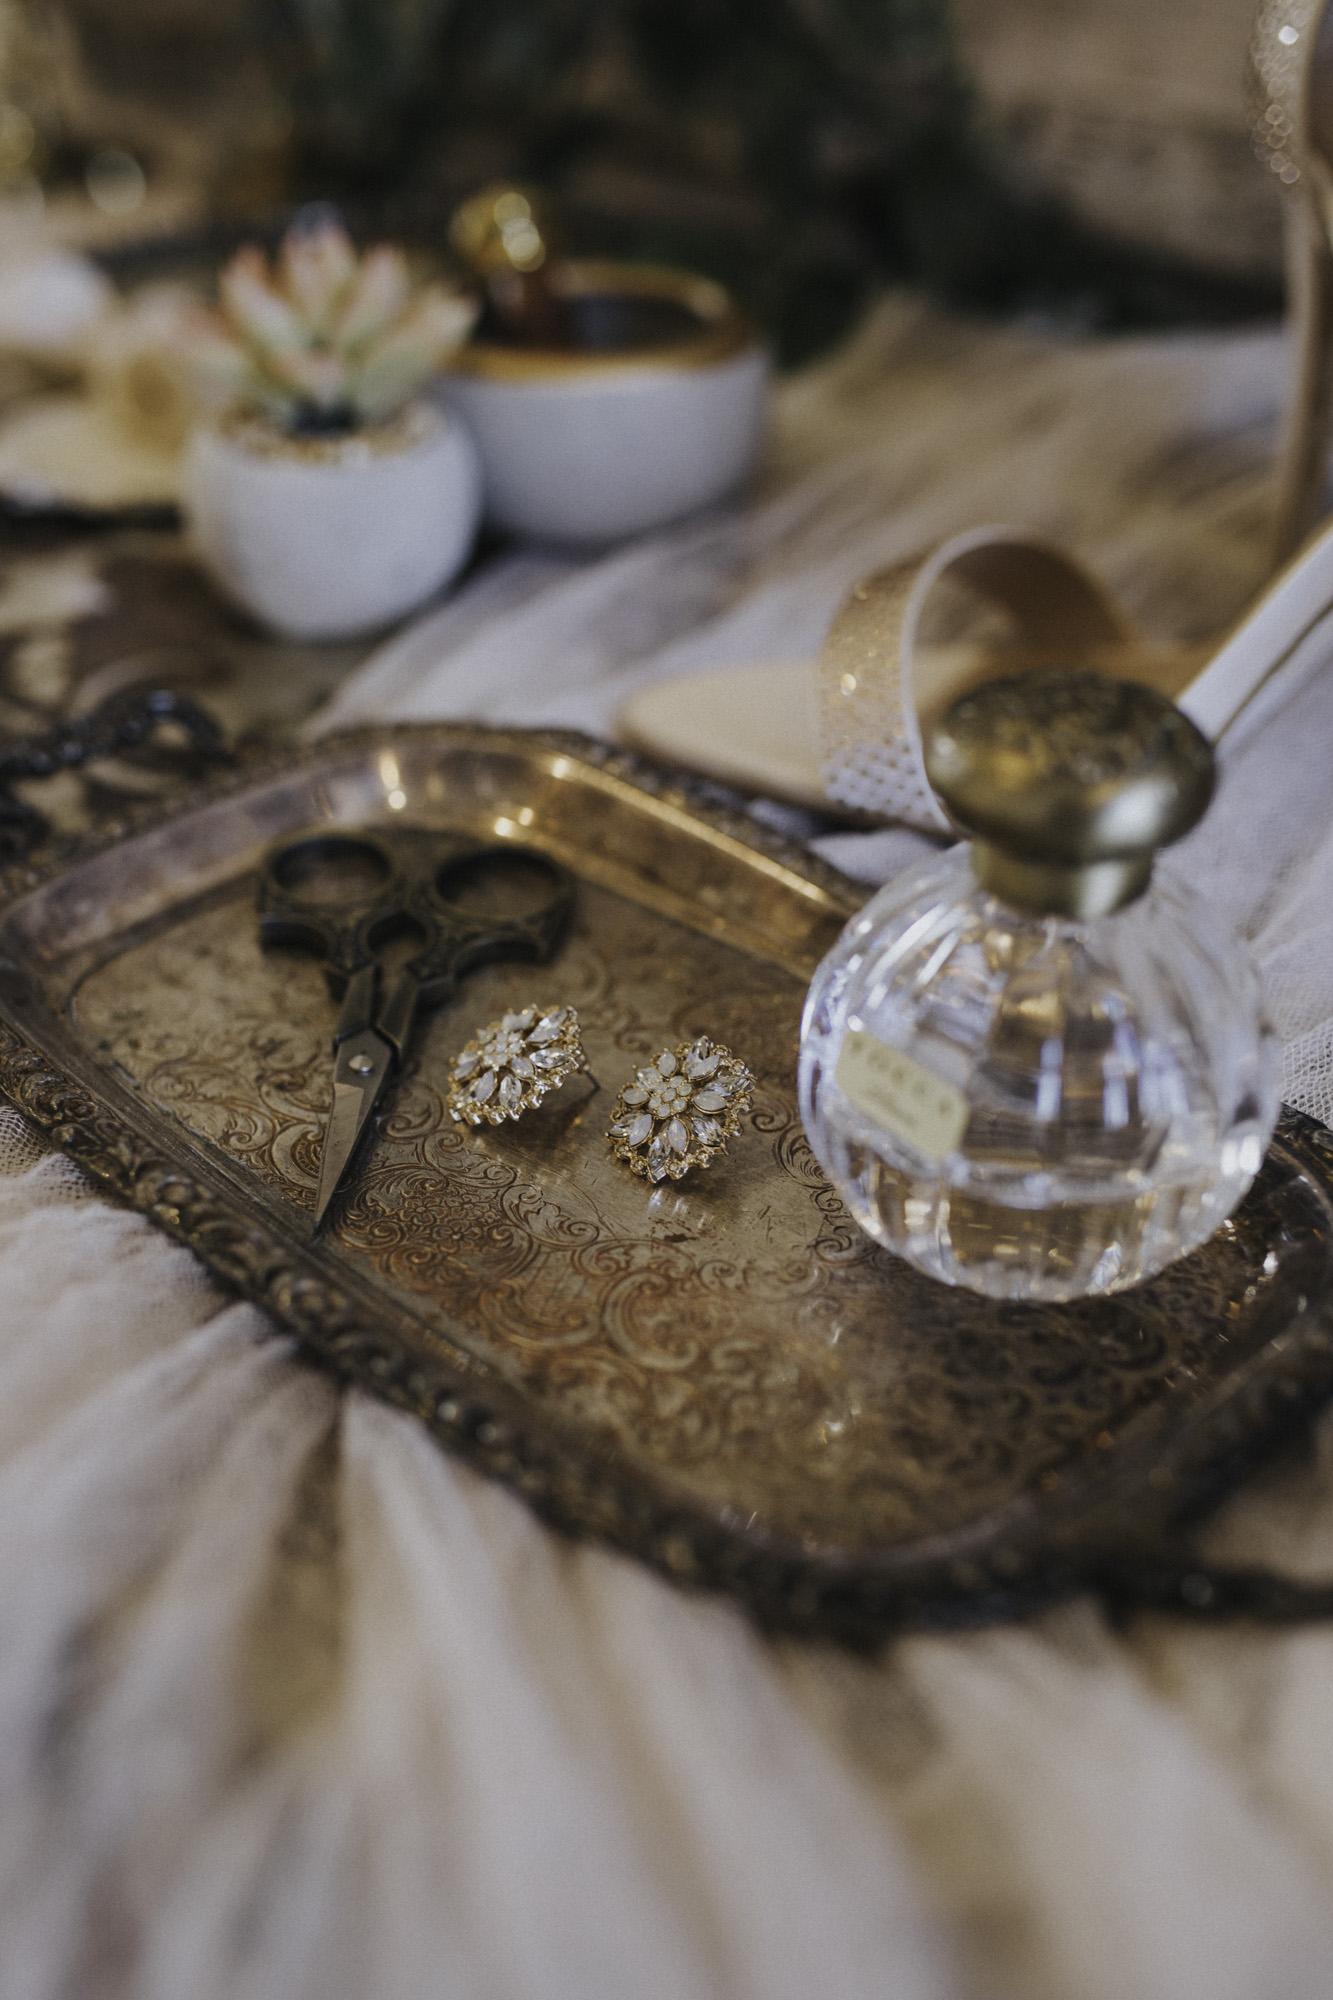 Cate_Ann_Photography_Dayton_Ohio_Wedding_Elopement_And_Engagement_PhotographerIMG_7846.jpg